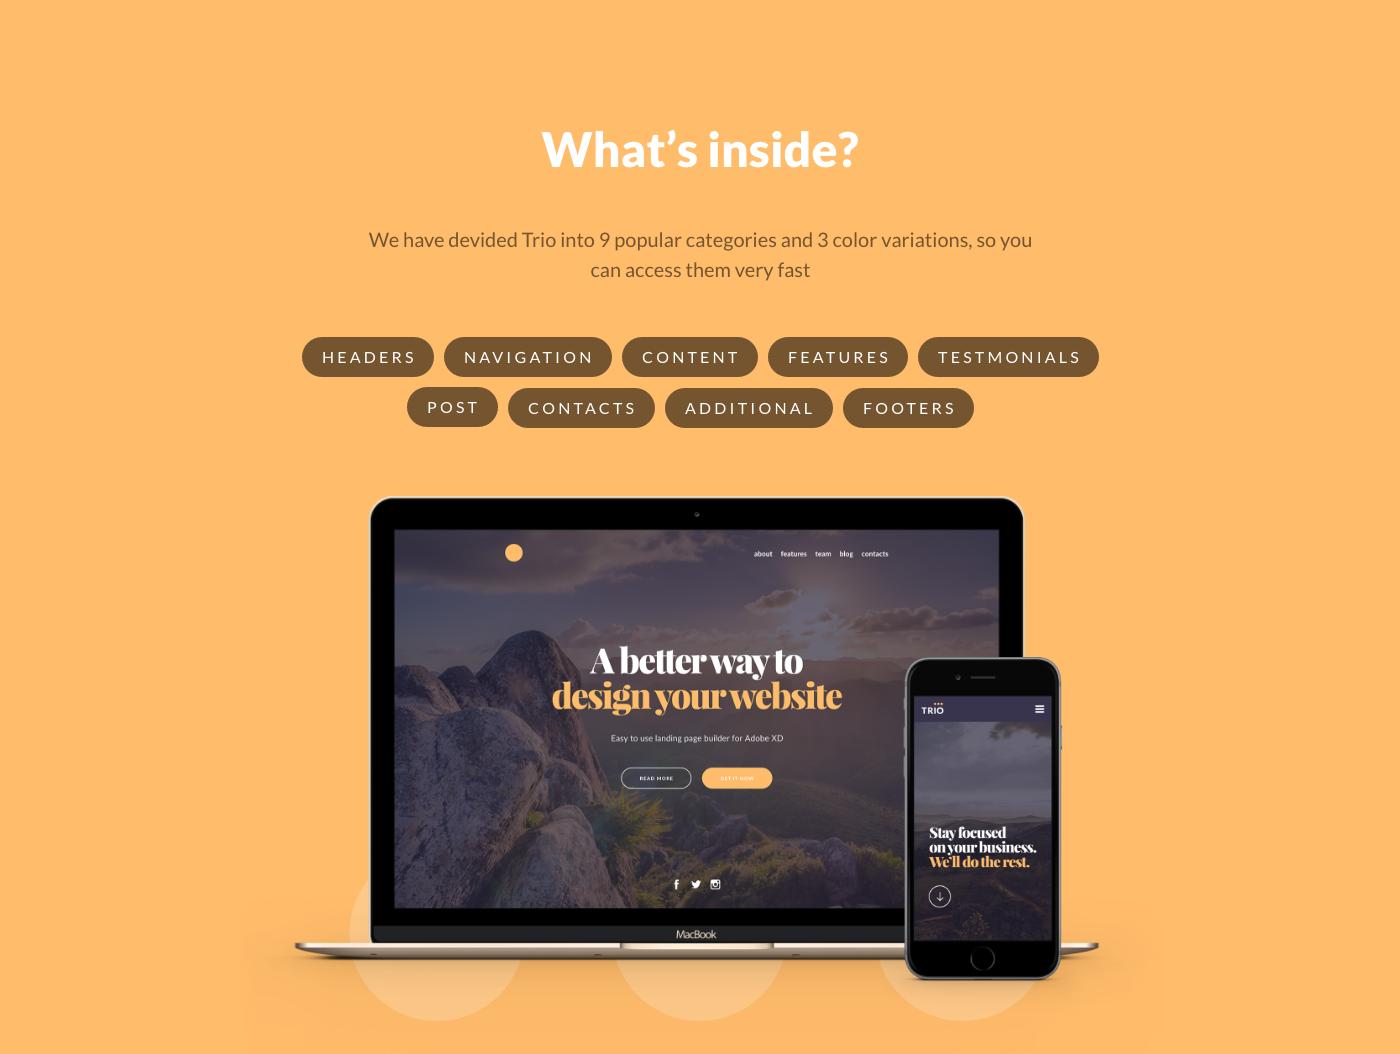 uikit ux projectcomet nickparker landing presentation page Web design MadeWithAdobeXd